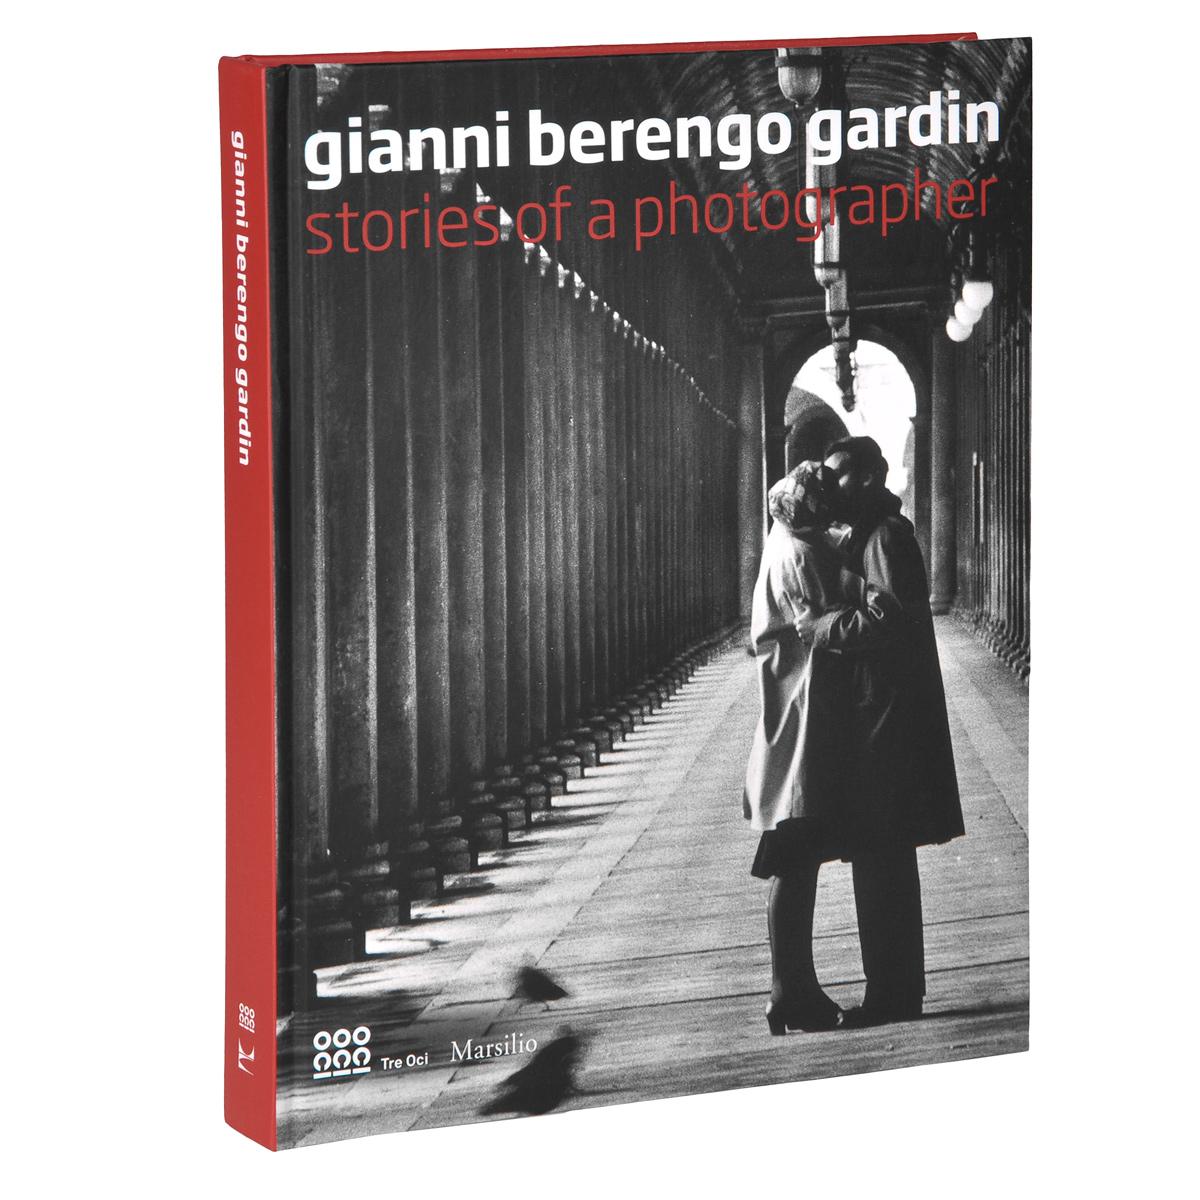 Gianni Berengo Gardin: Stories of A Photographer